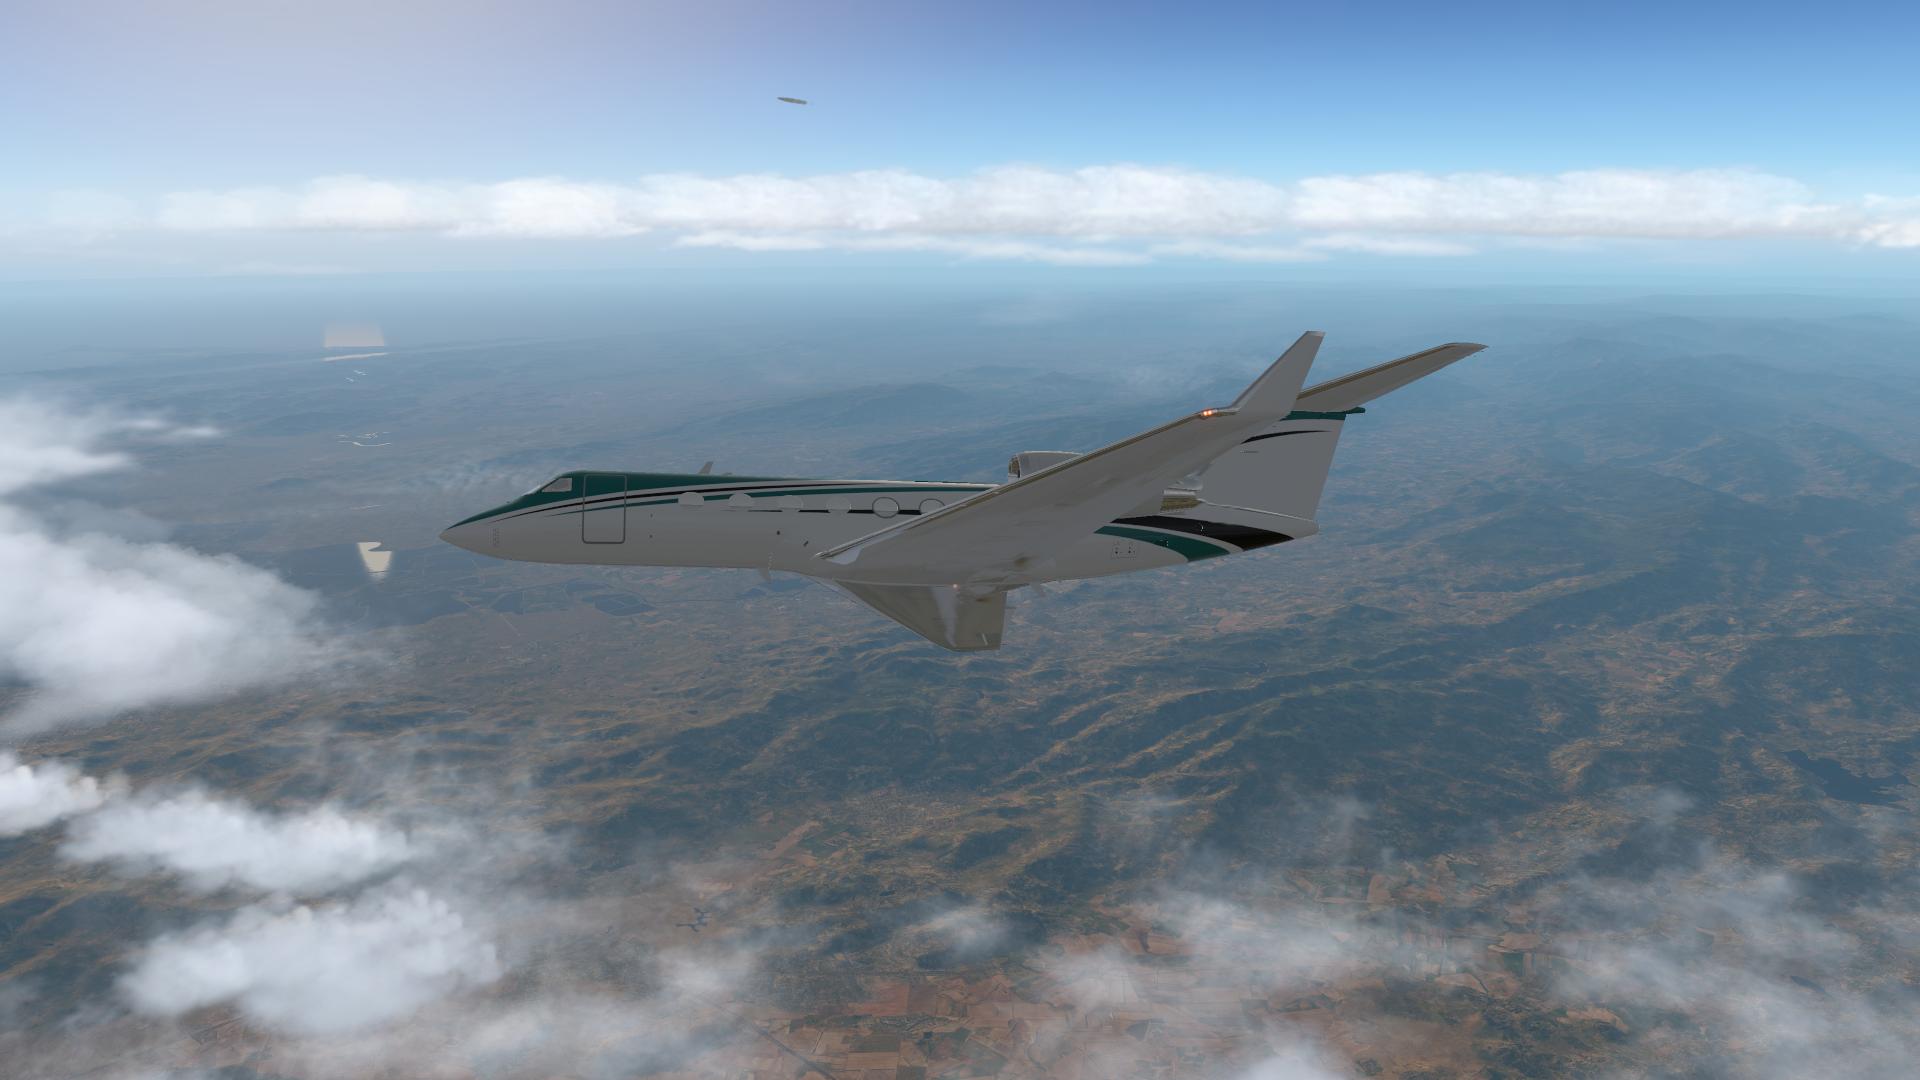 Gulfstream G-IV SP V11 - General Aviation - X-Plane Org Forum